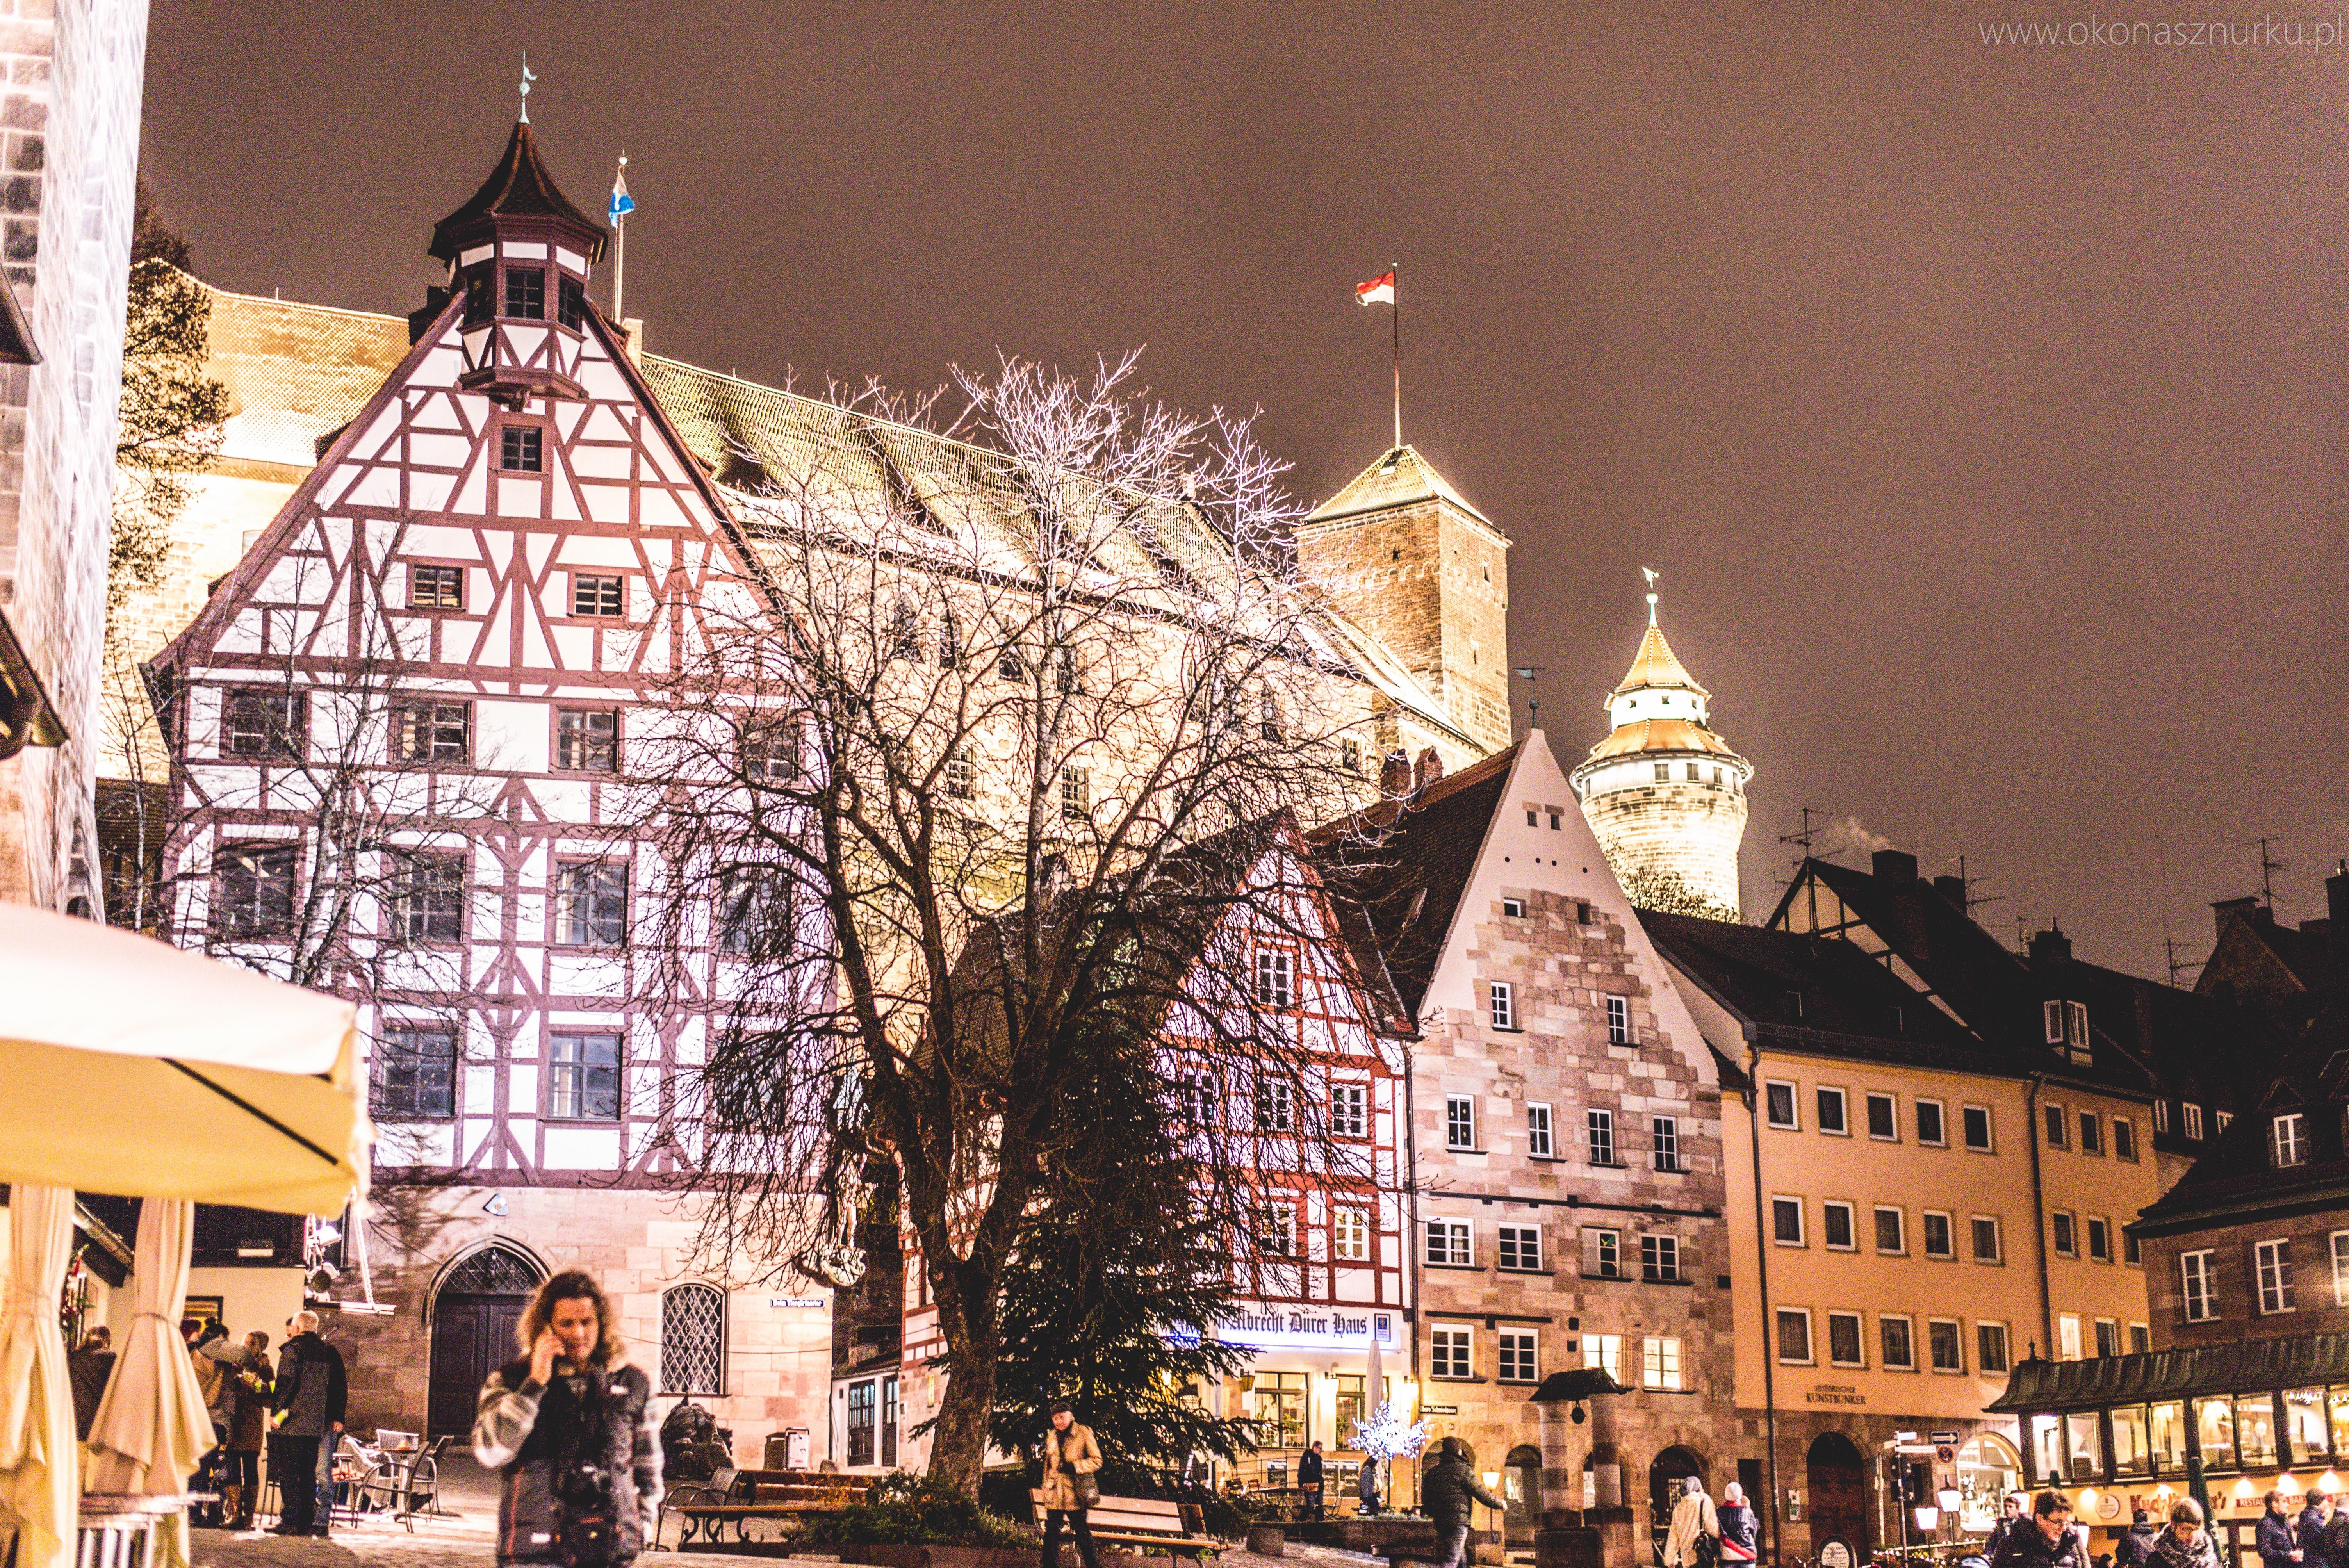 Nürnberg-stadt-norymberga-bayern-city-frankonia (16)